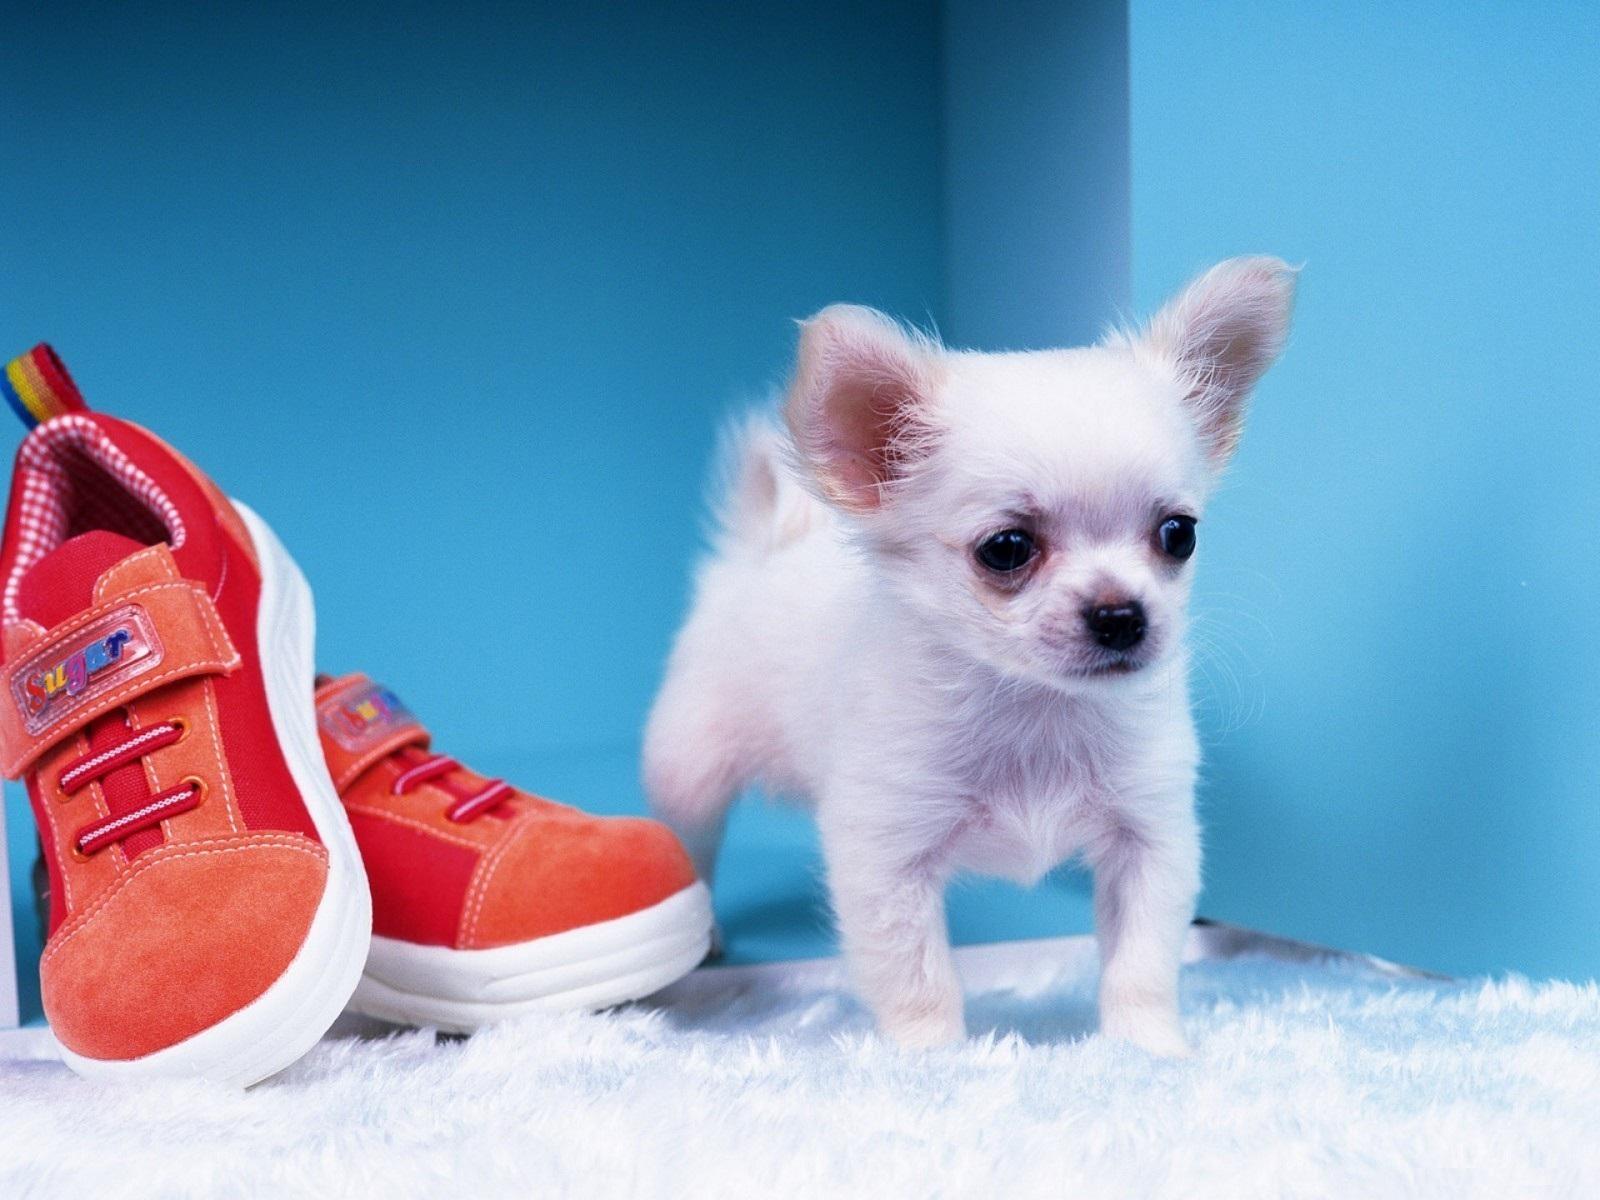 Chihuahua Dog photos & images